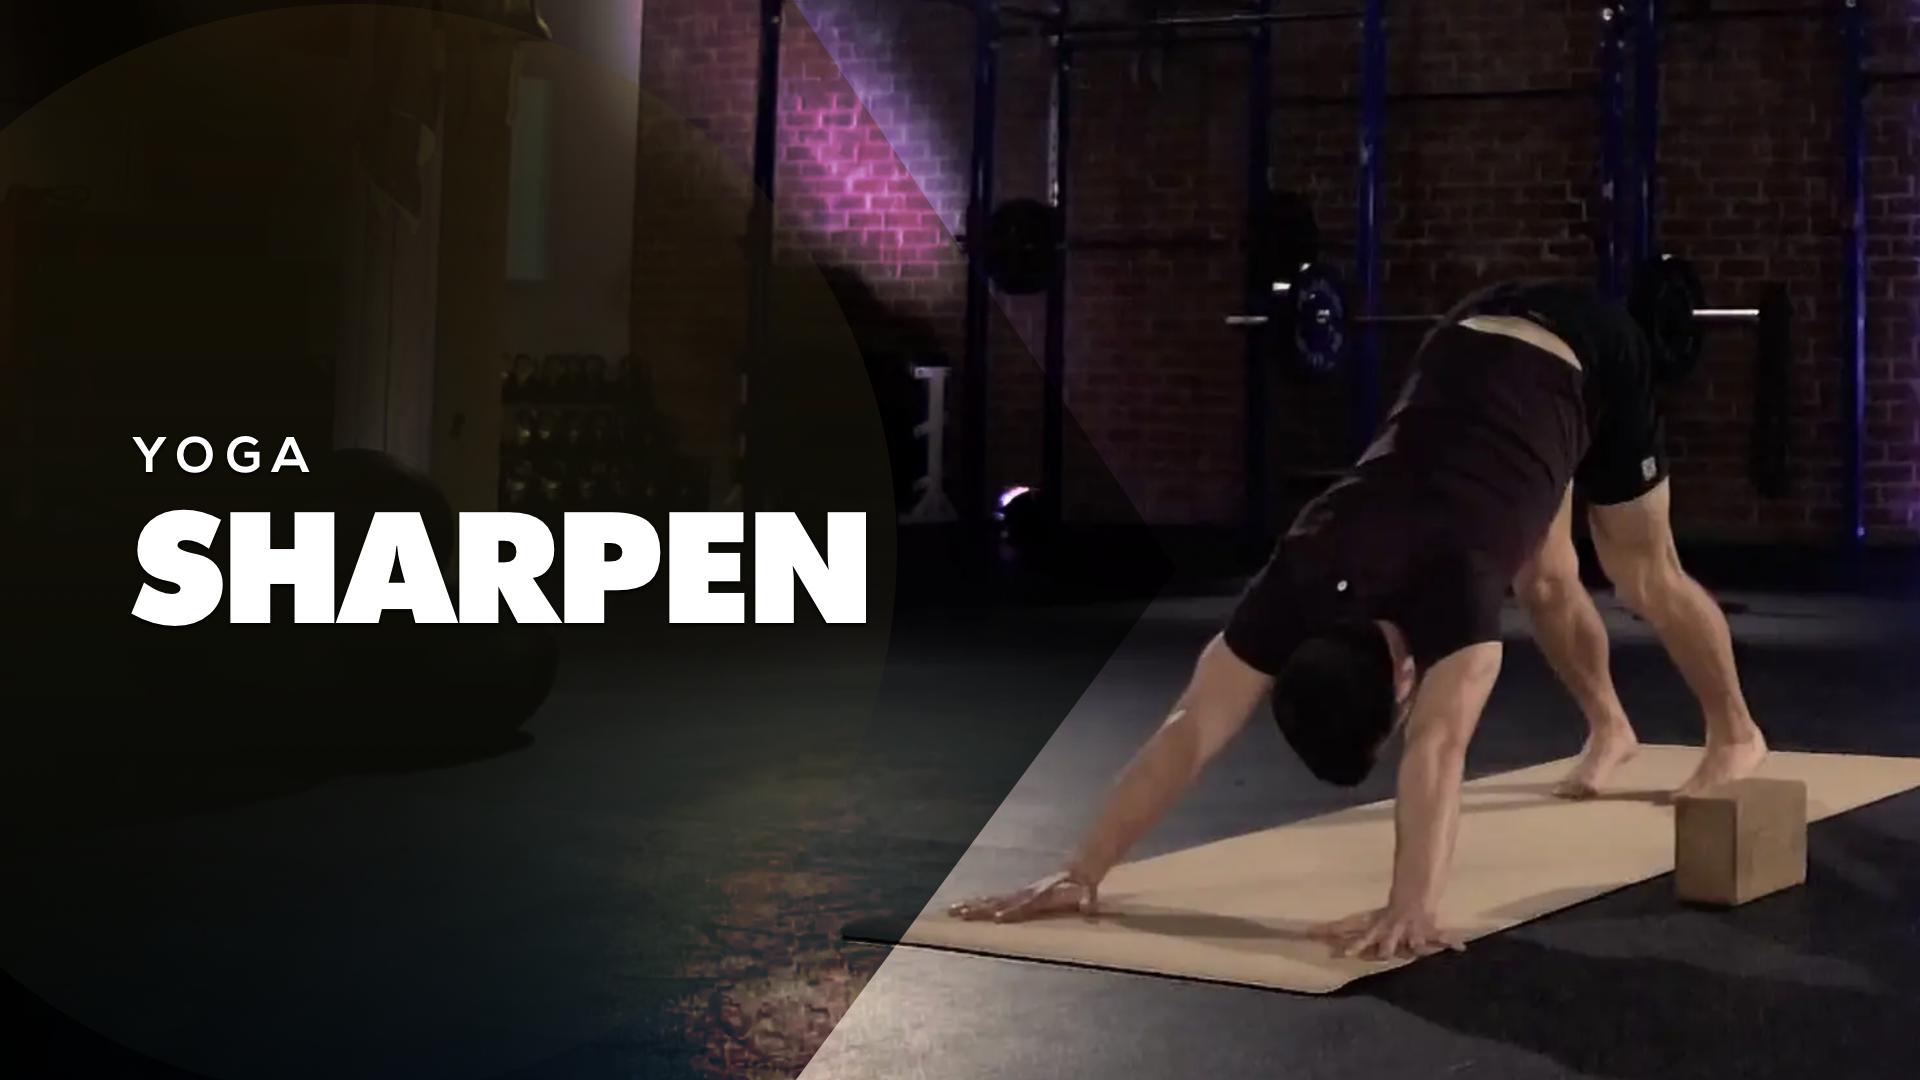 Yoga Sharpen 4